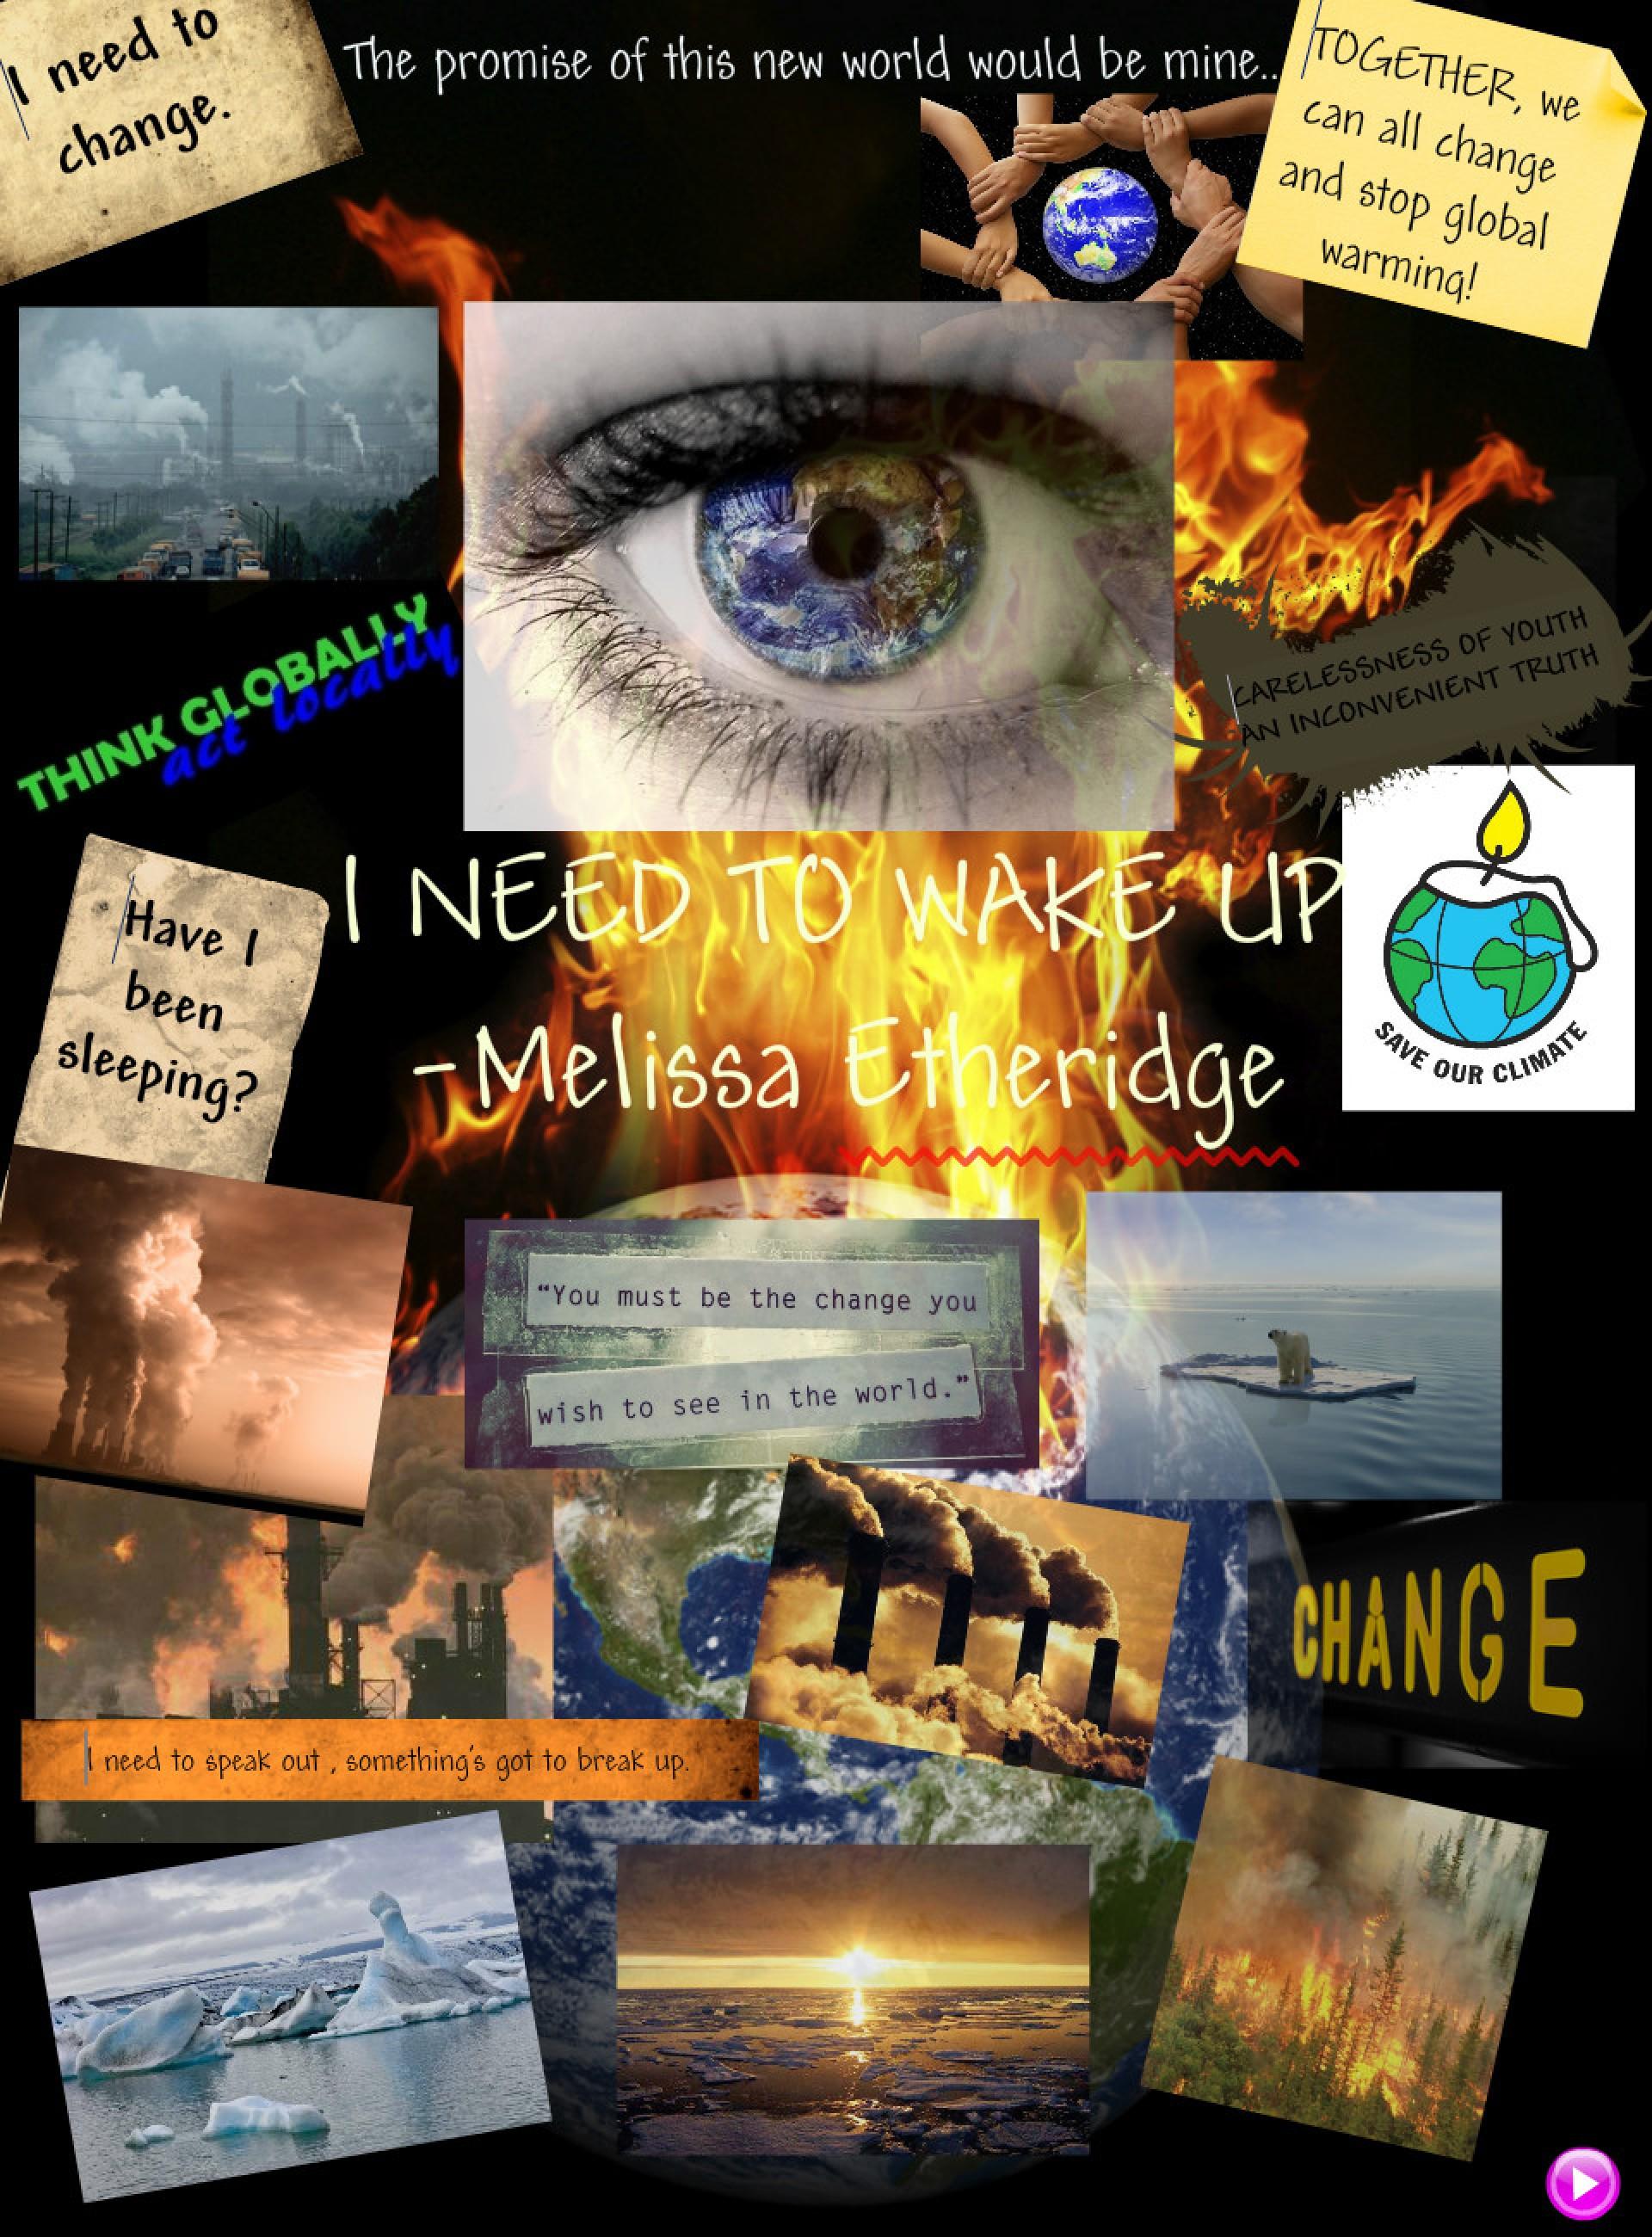 008 Essay Example Visual I Need To Wake Up Melissa Etheridge Verbal Shocking Response Examples Literacy Arts 1920